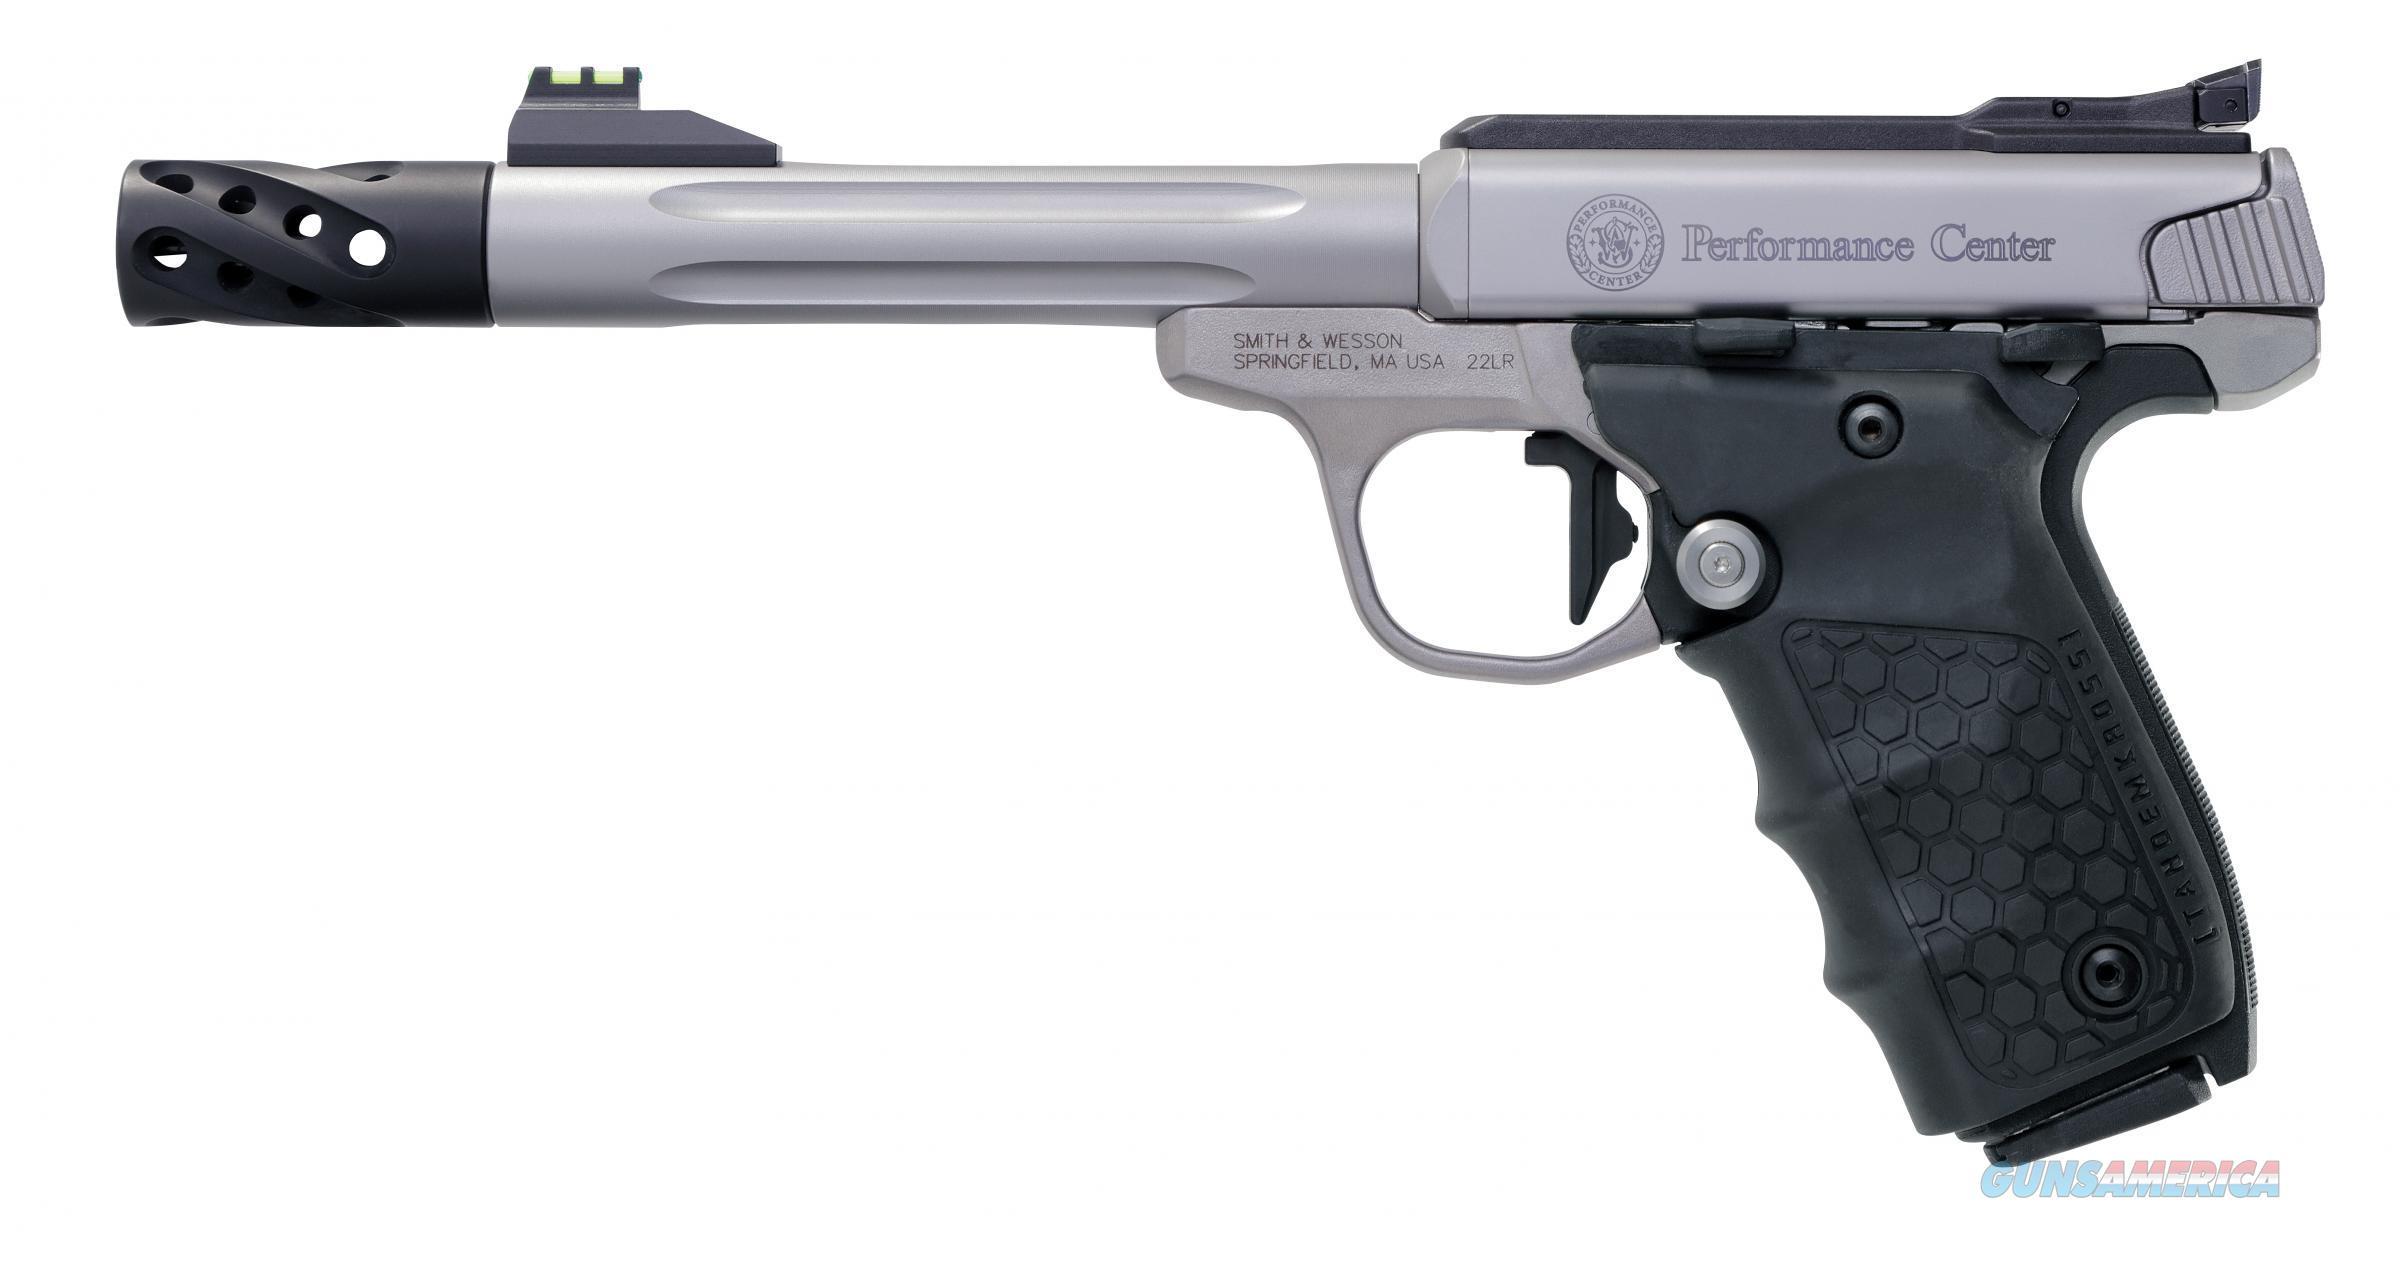 "Smith & Wesson SW22 Performance Center Victory .22 LR 6"" Target Barrel Fiber Optic 12078 *NEW*  Guns > Pistols > Smith & Wesson Pistols - Autos > .22 Autos"